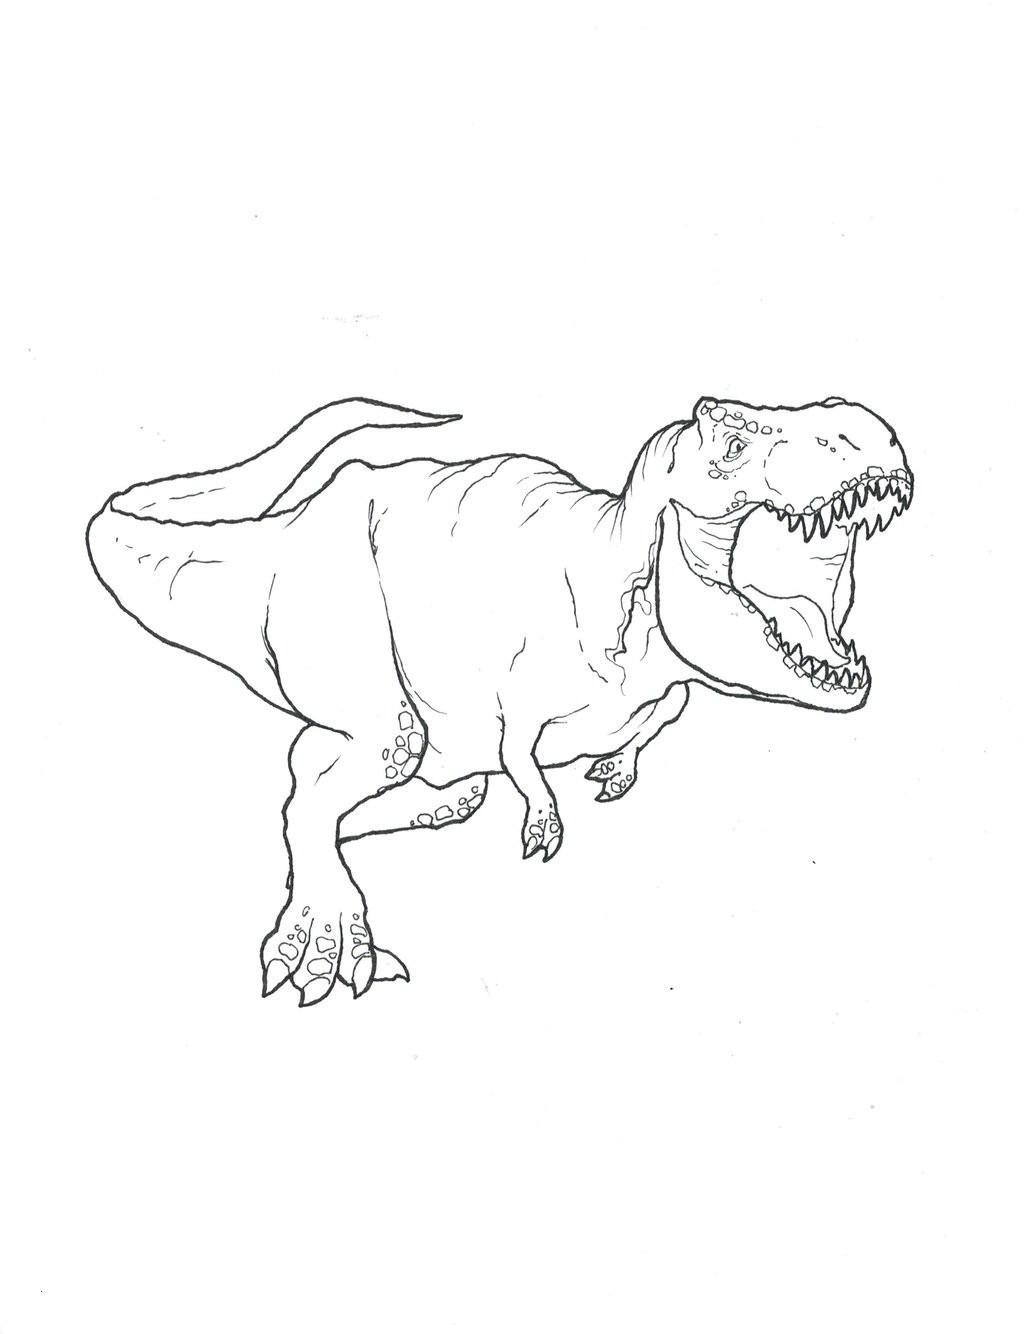 T Rex Ausmalbild Neu 35 T Rex Ausmalbilder Scoredatscore Einzigartig Dinosaurier Rex Bild